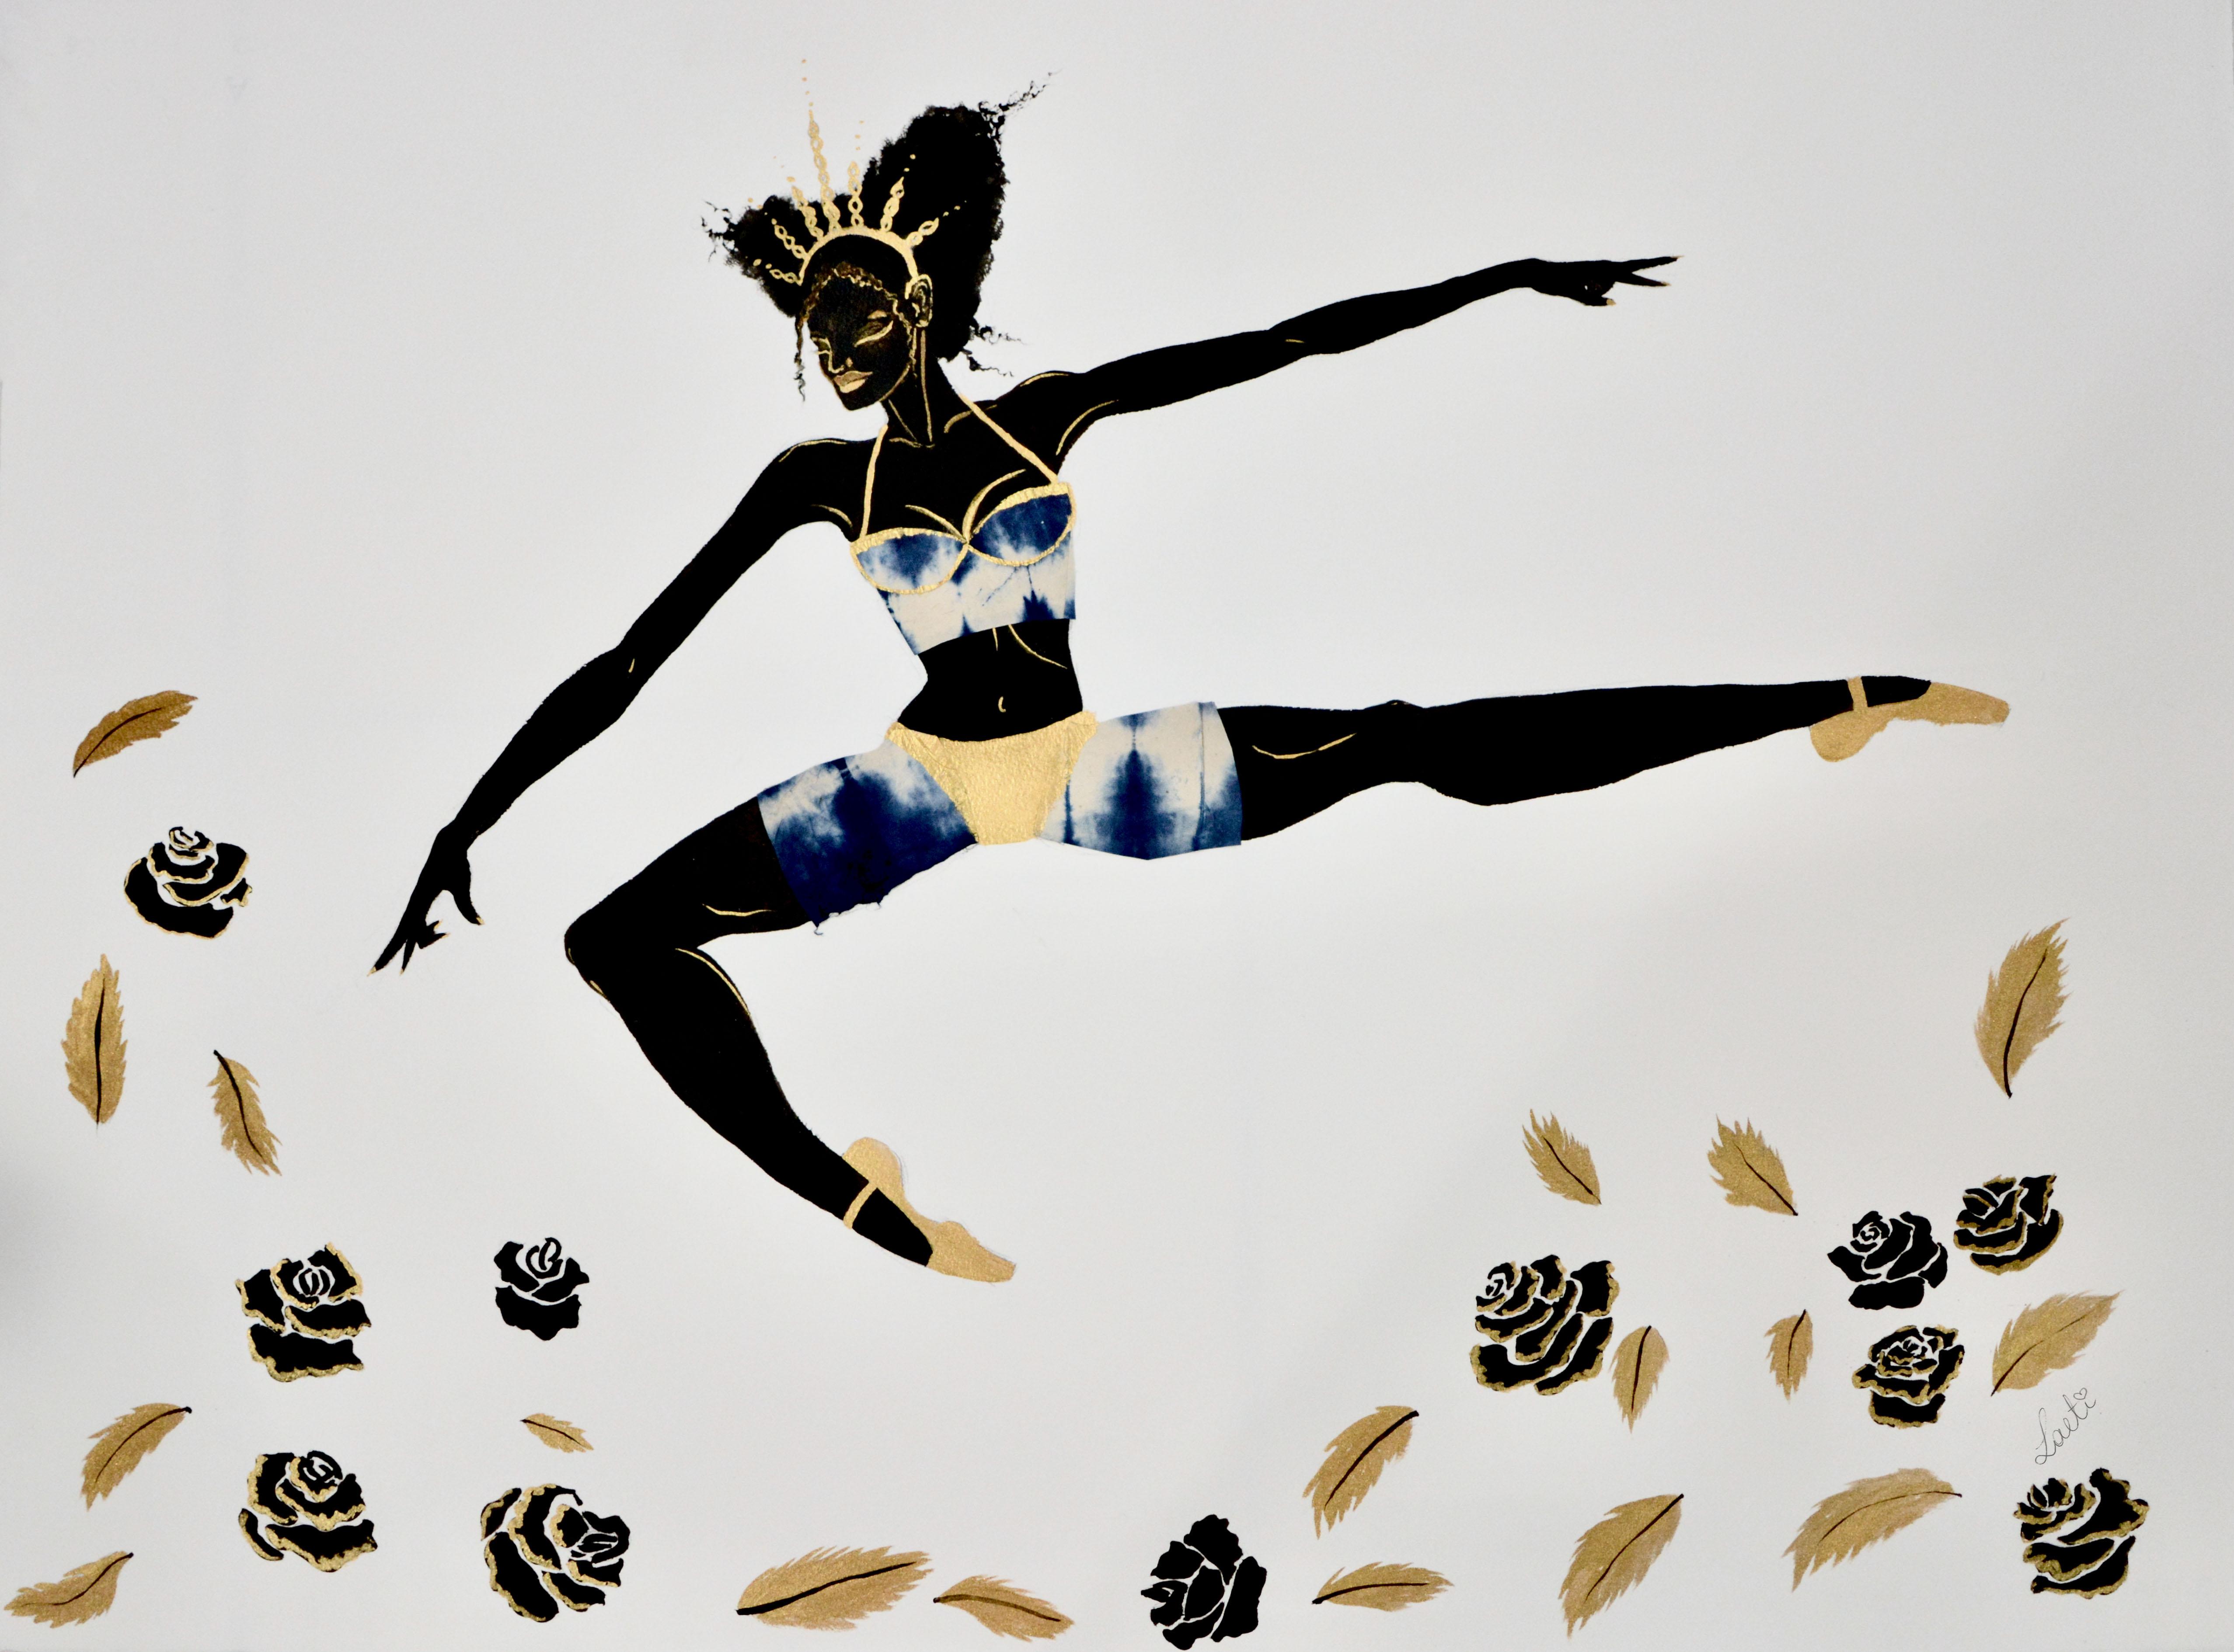 Black Figure: Leaping Dancer